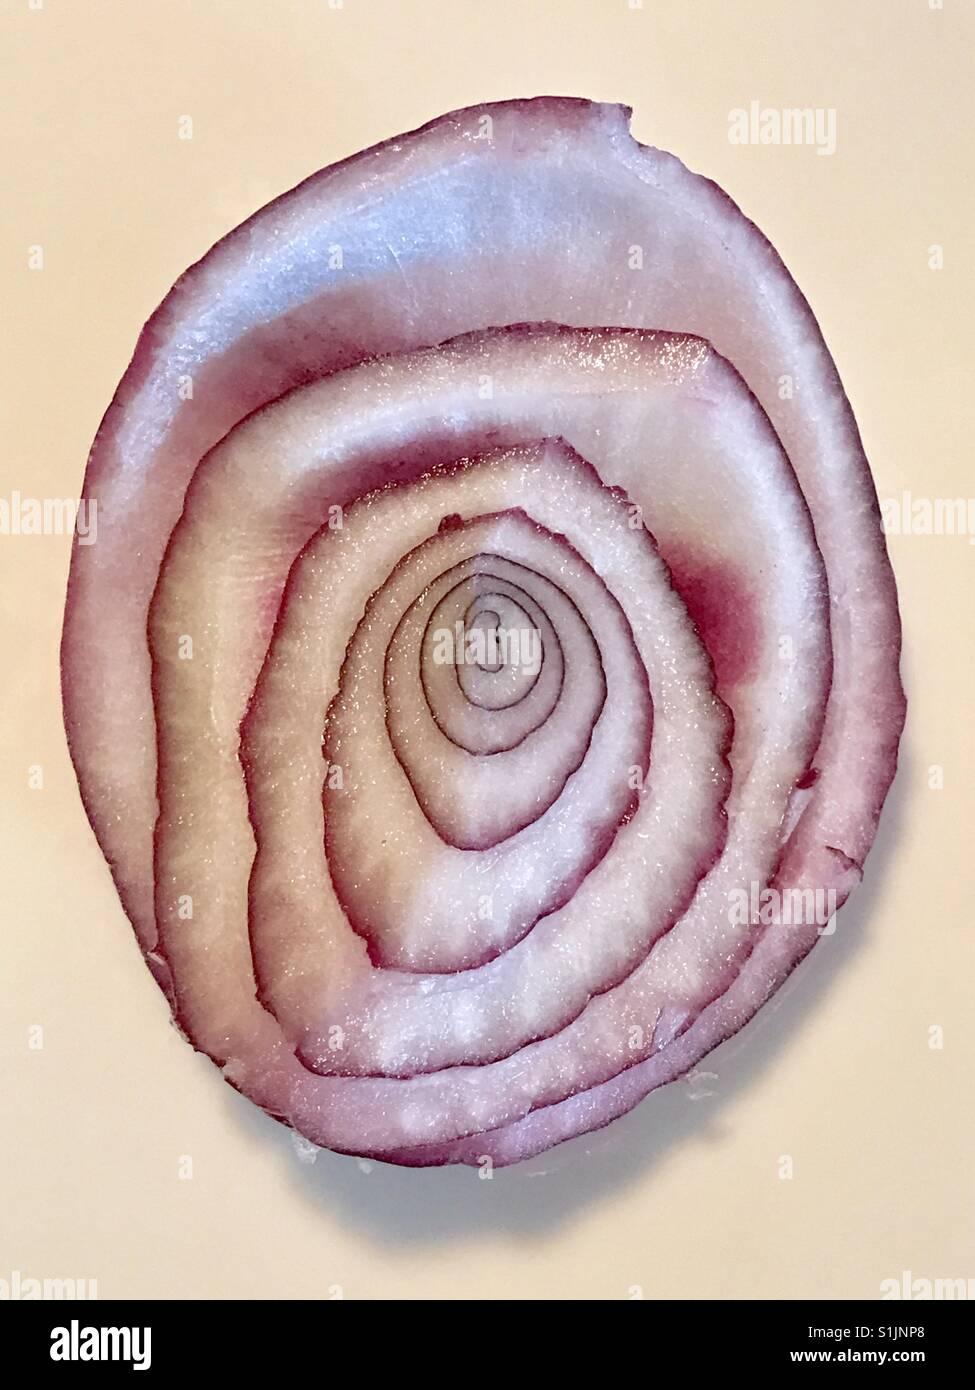 Rote Zwiebel, in Scheiben geschnitten im Querschnitt, Muster ...